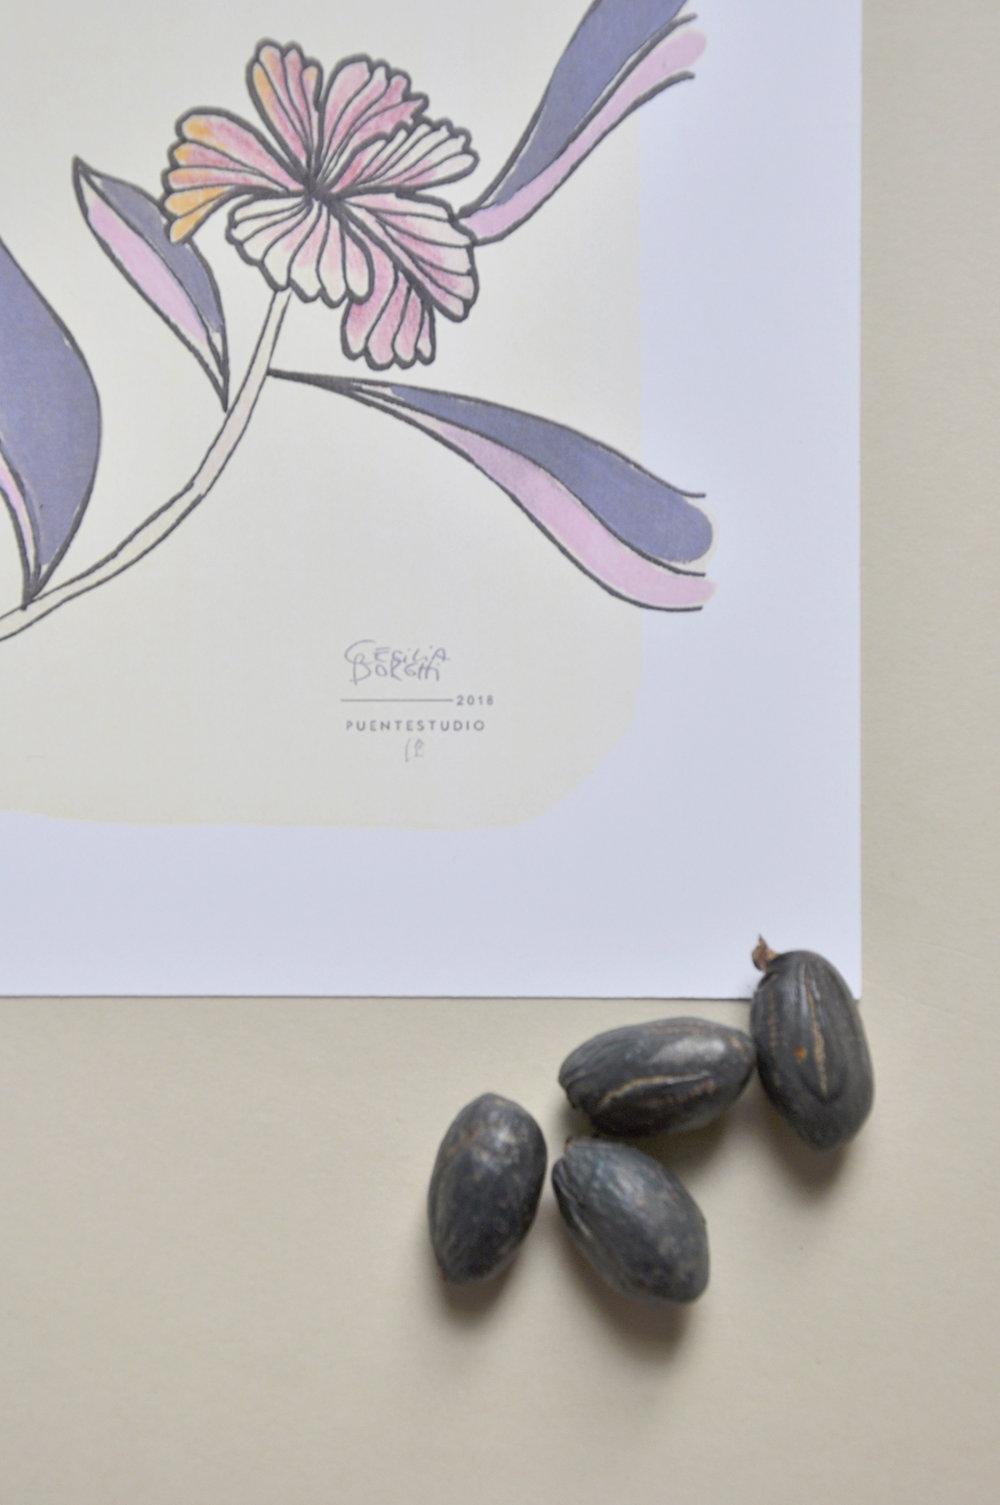 ceciliaborghi_puentestudio_magnolia6.jpg